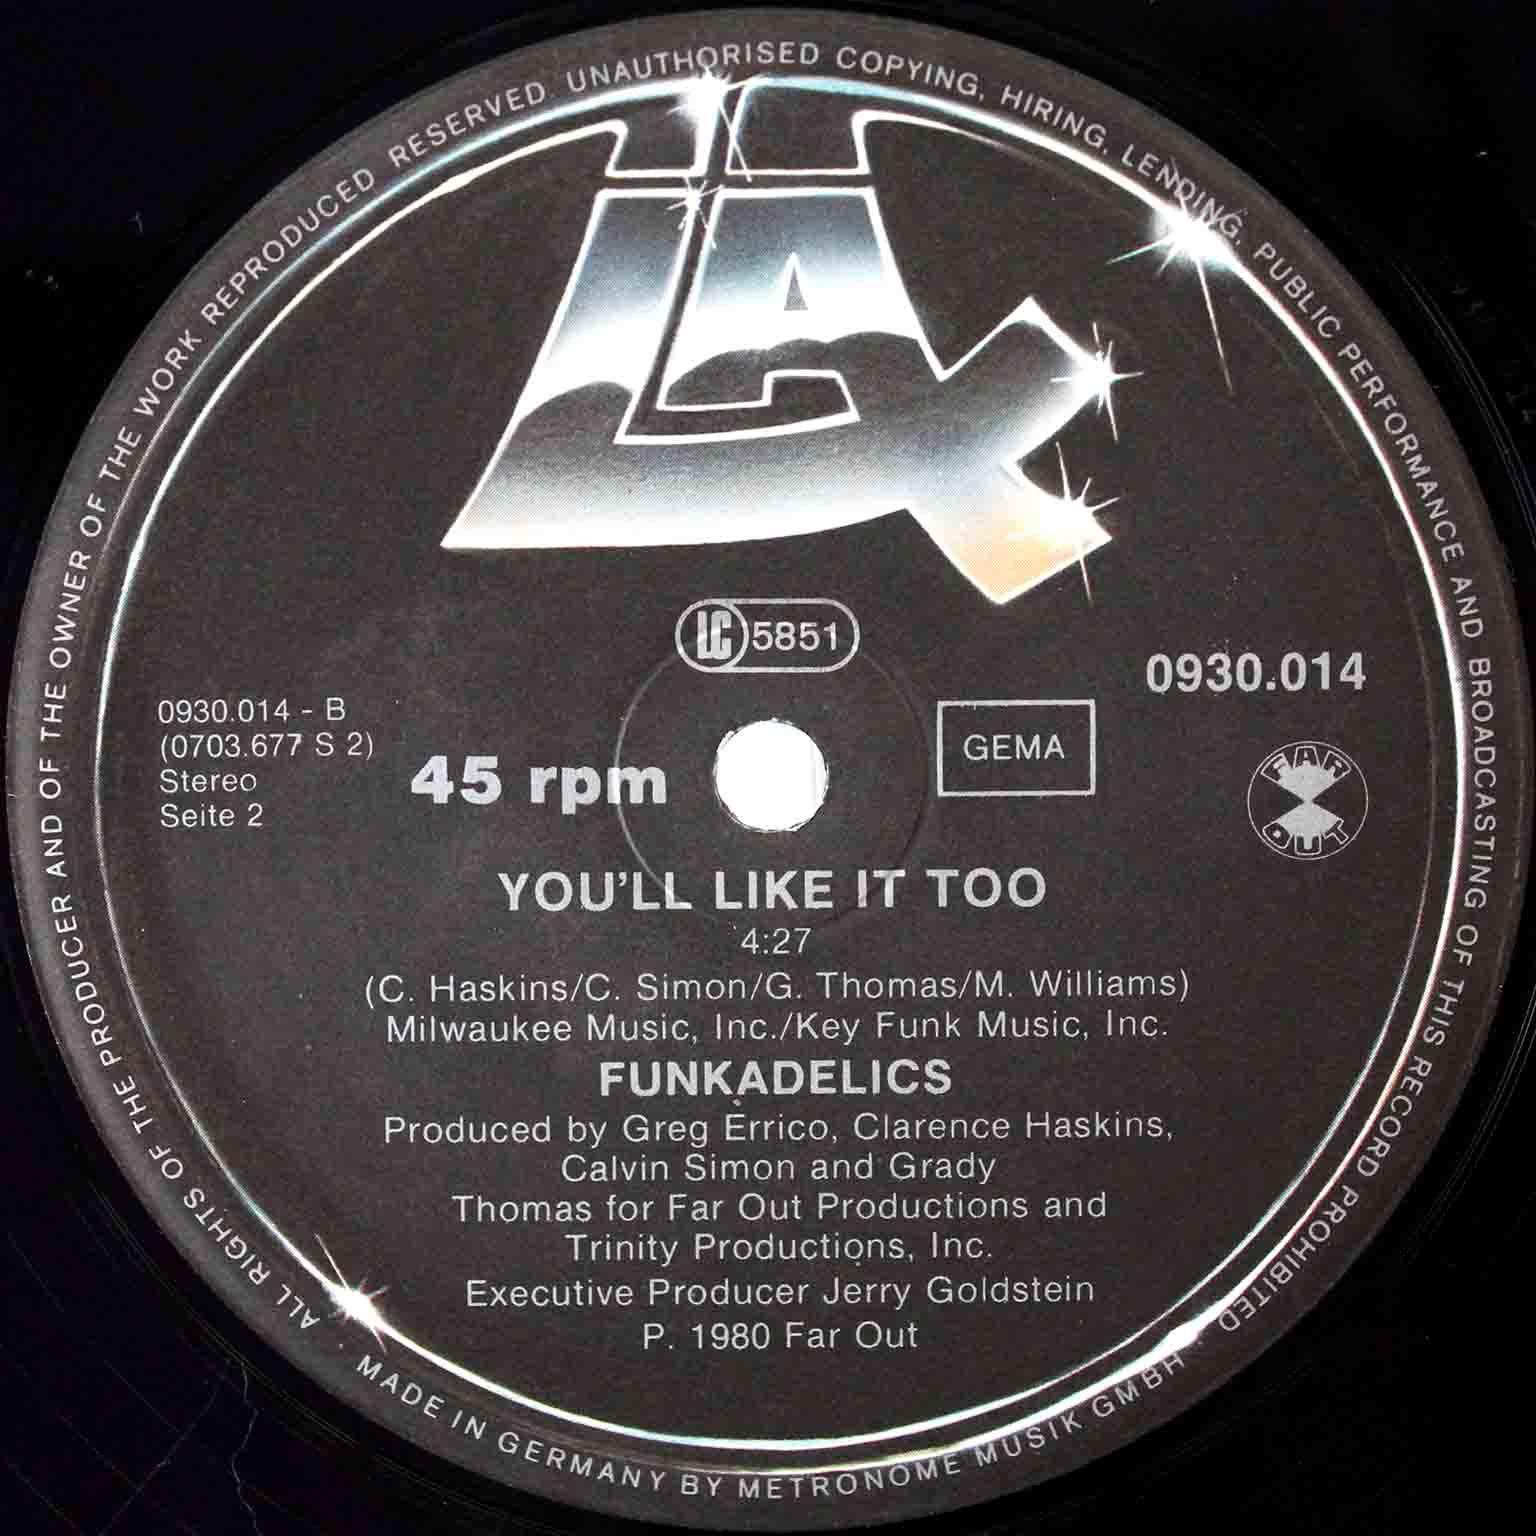 Funkadelics - Youll Like It Too 02